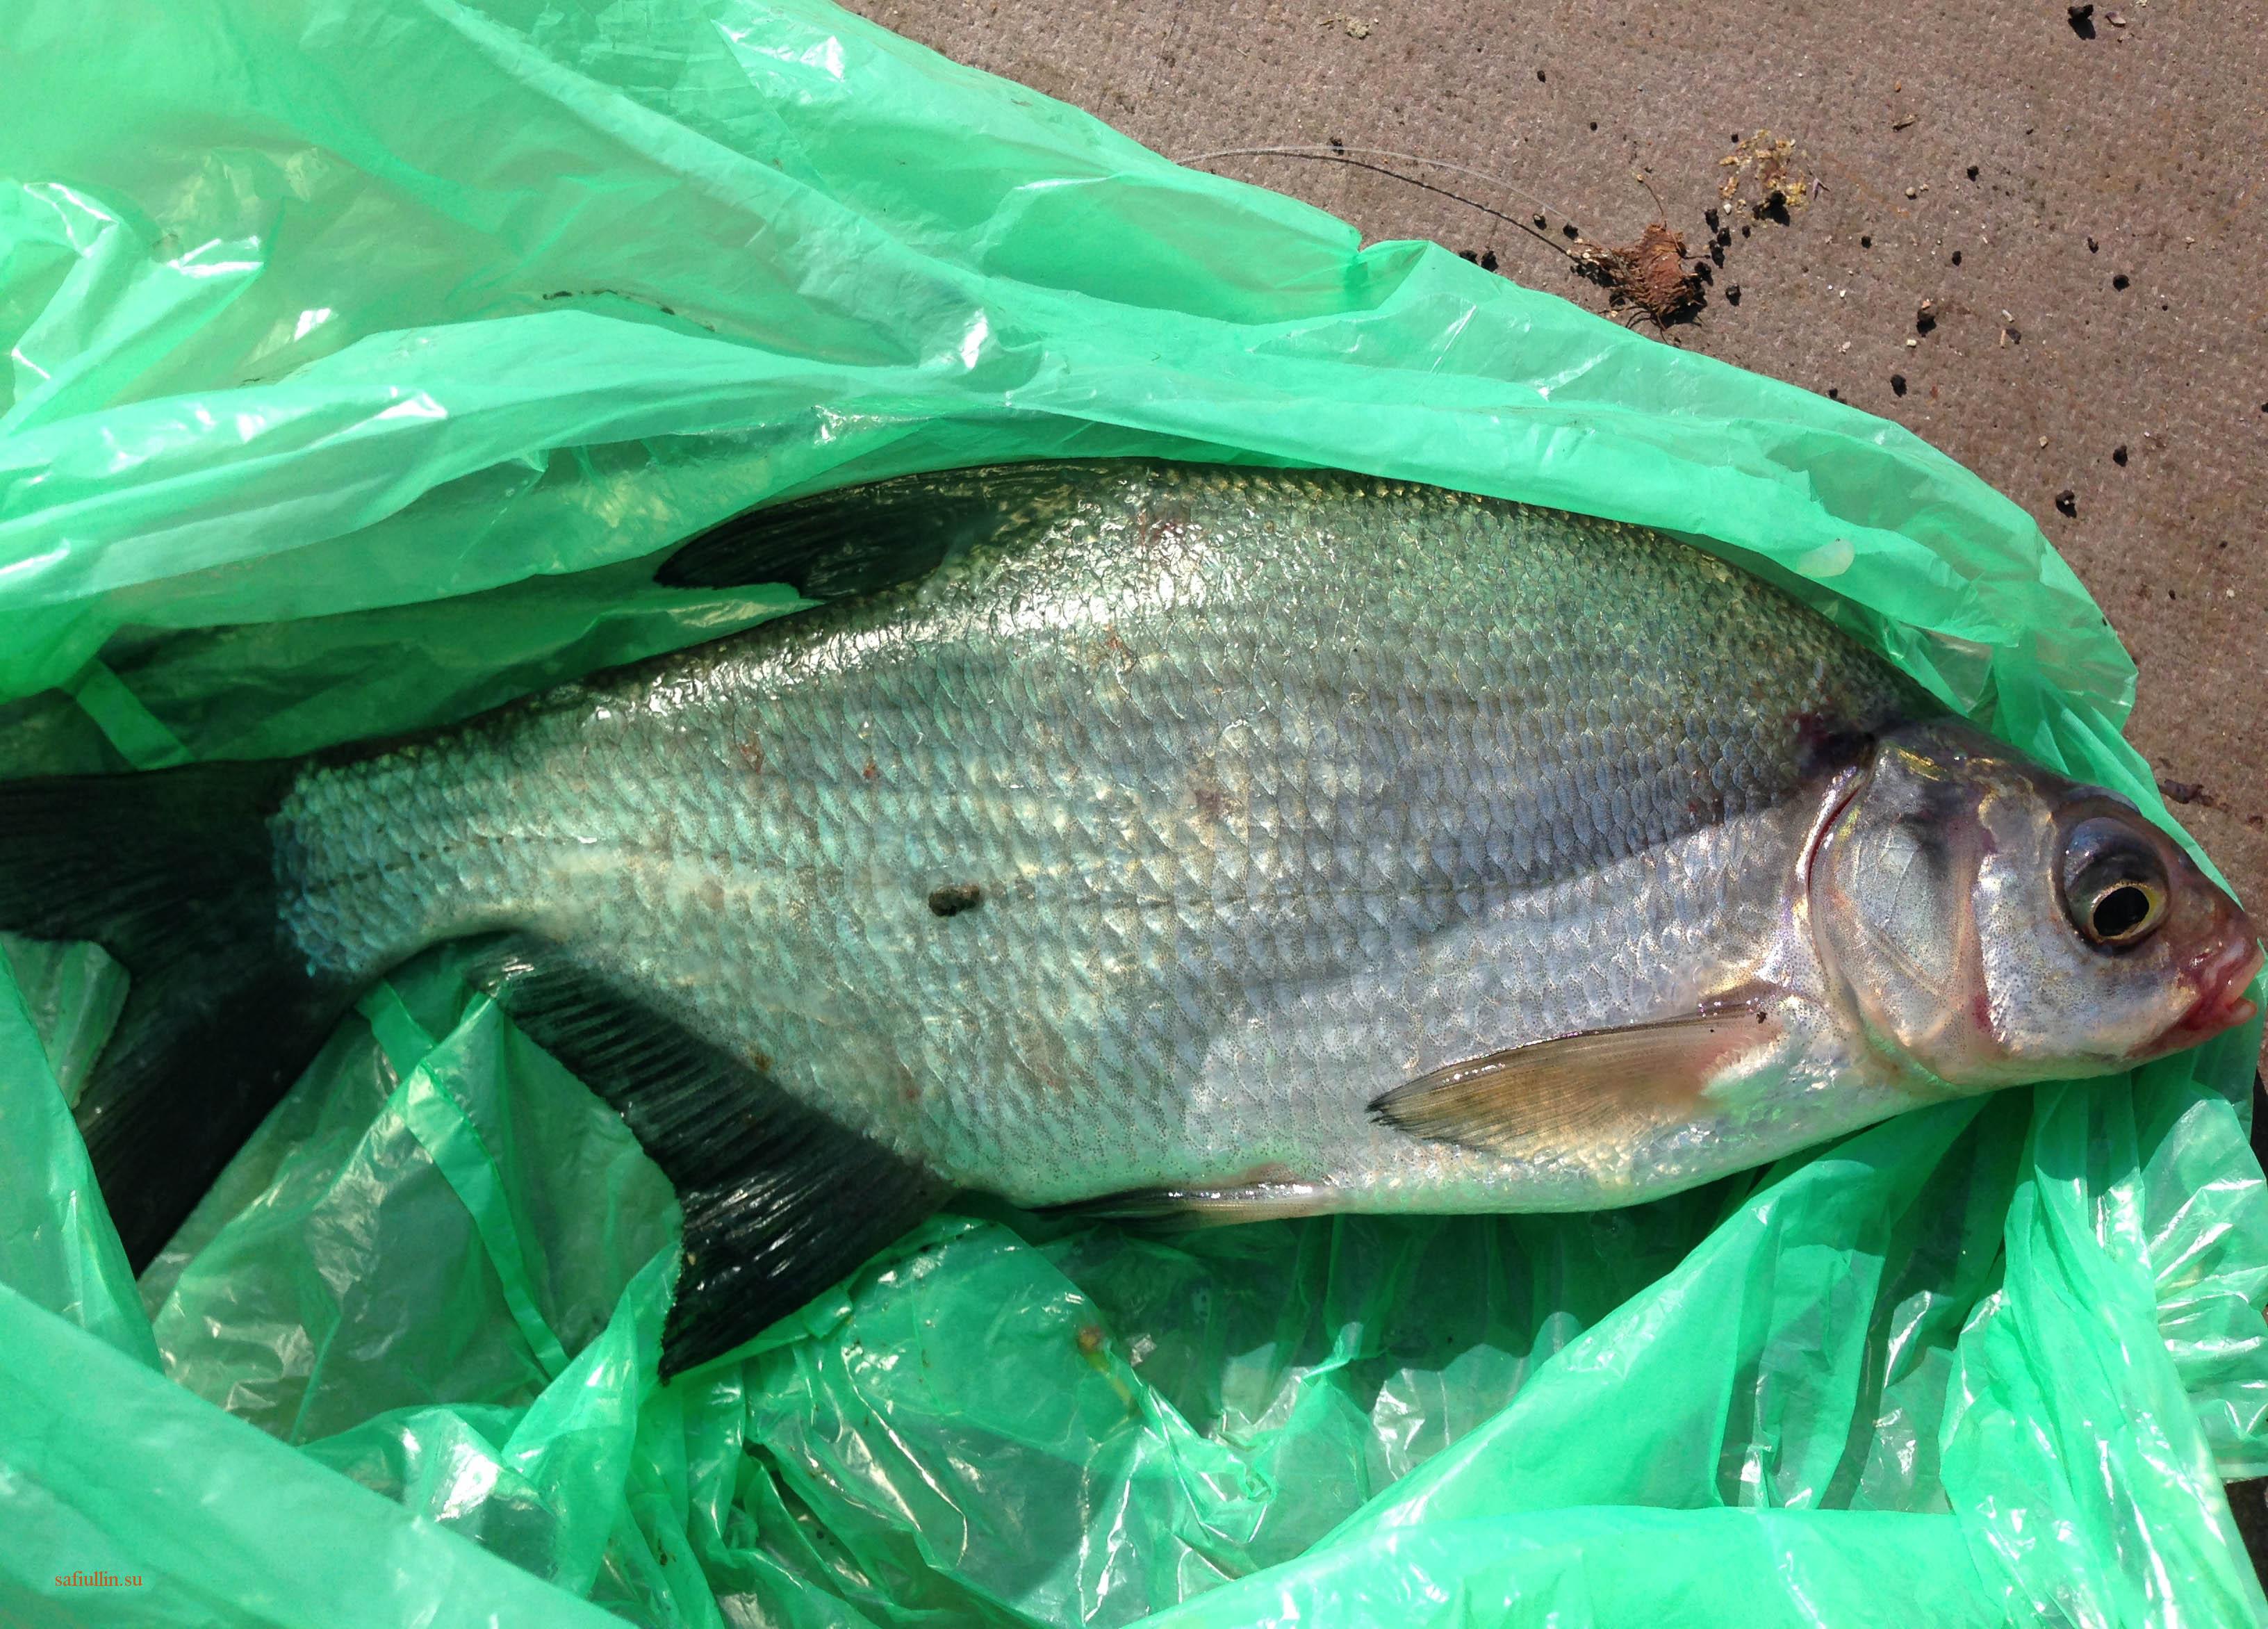 пейзажи природы альберт сафиуллин лето река лиелупе лещ рыбалка